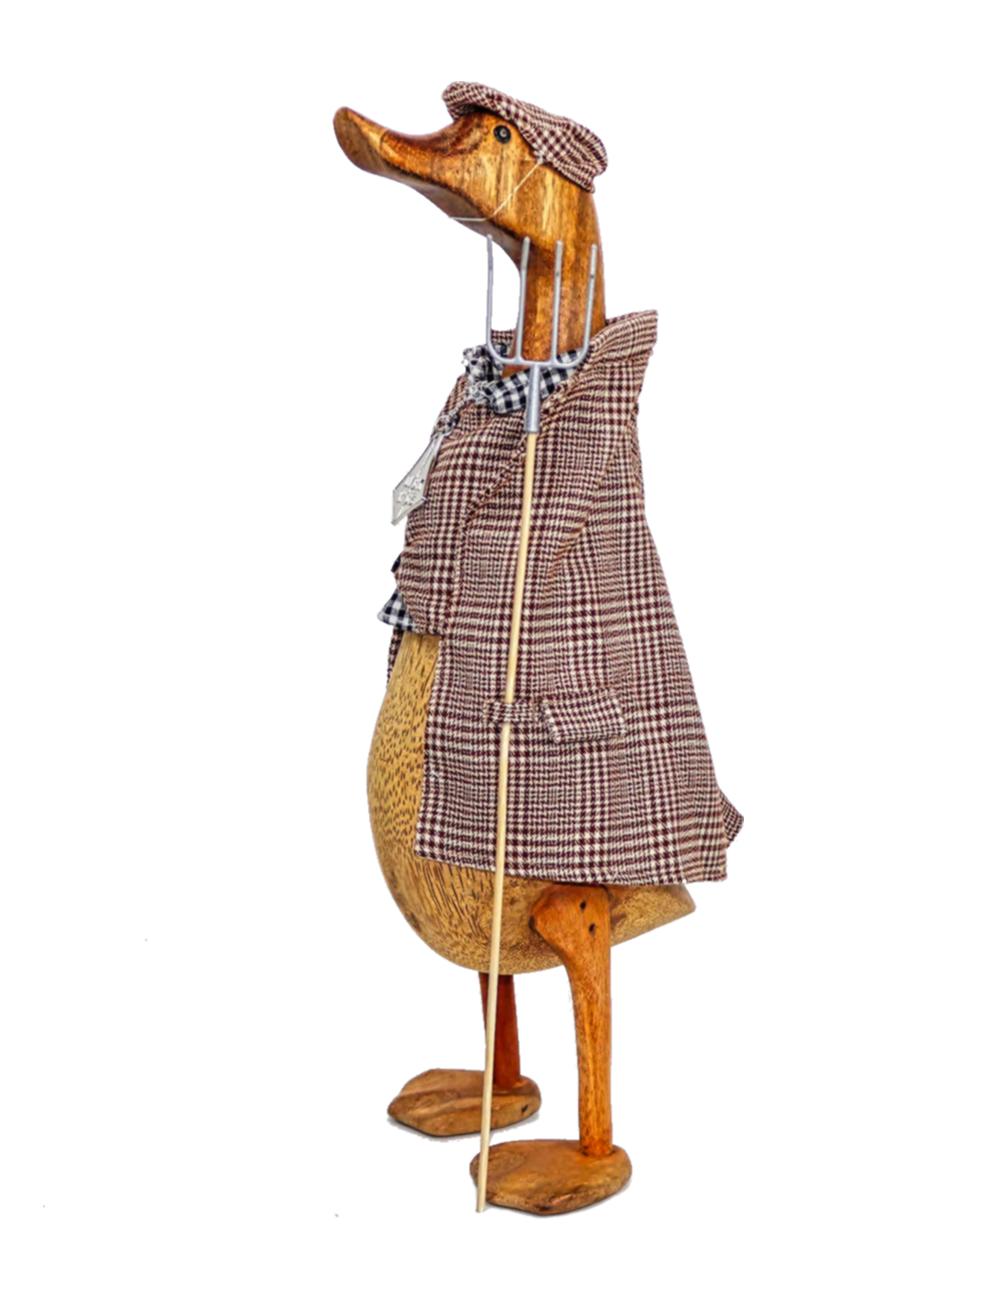 Farmer Wooden Duck